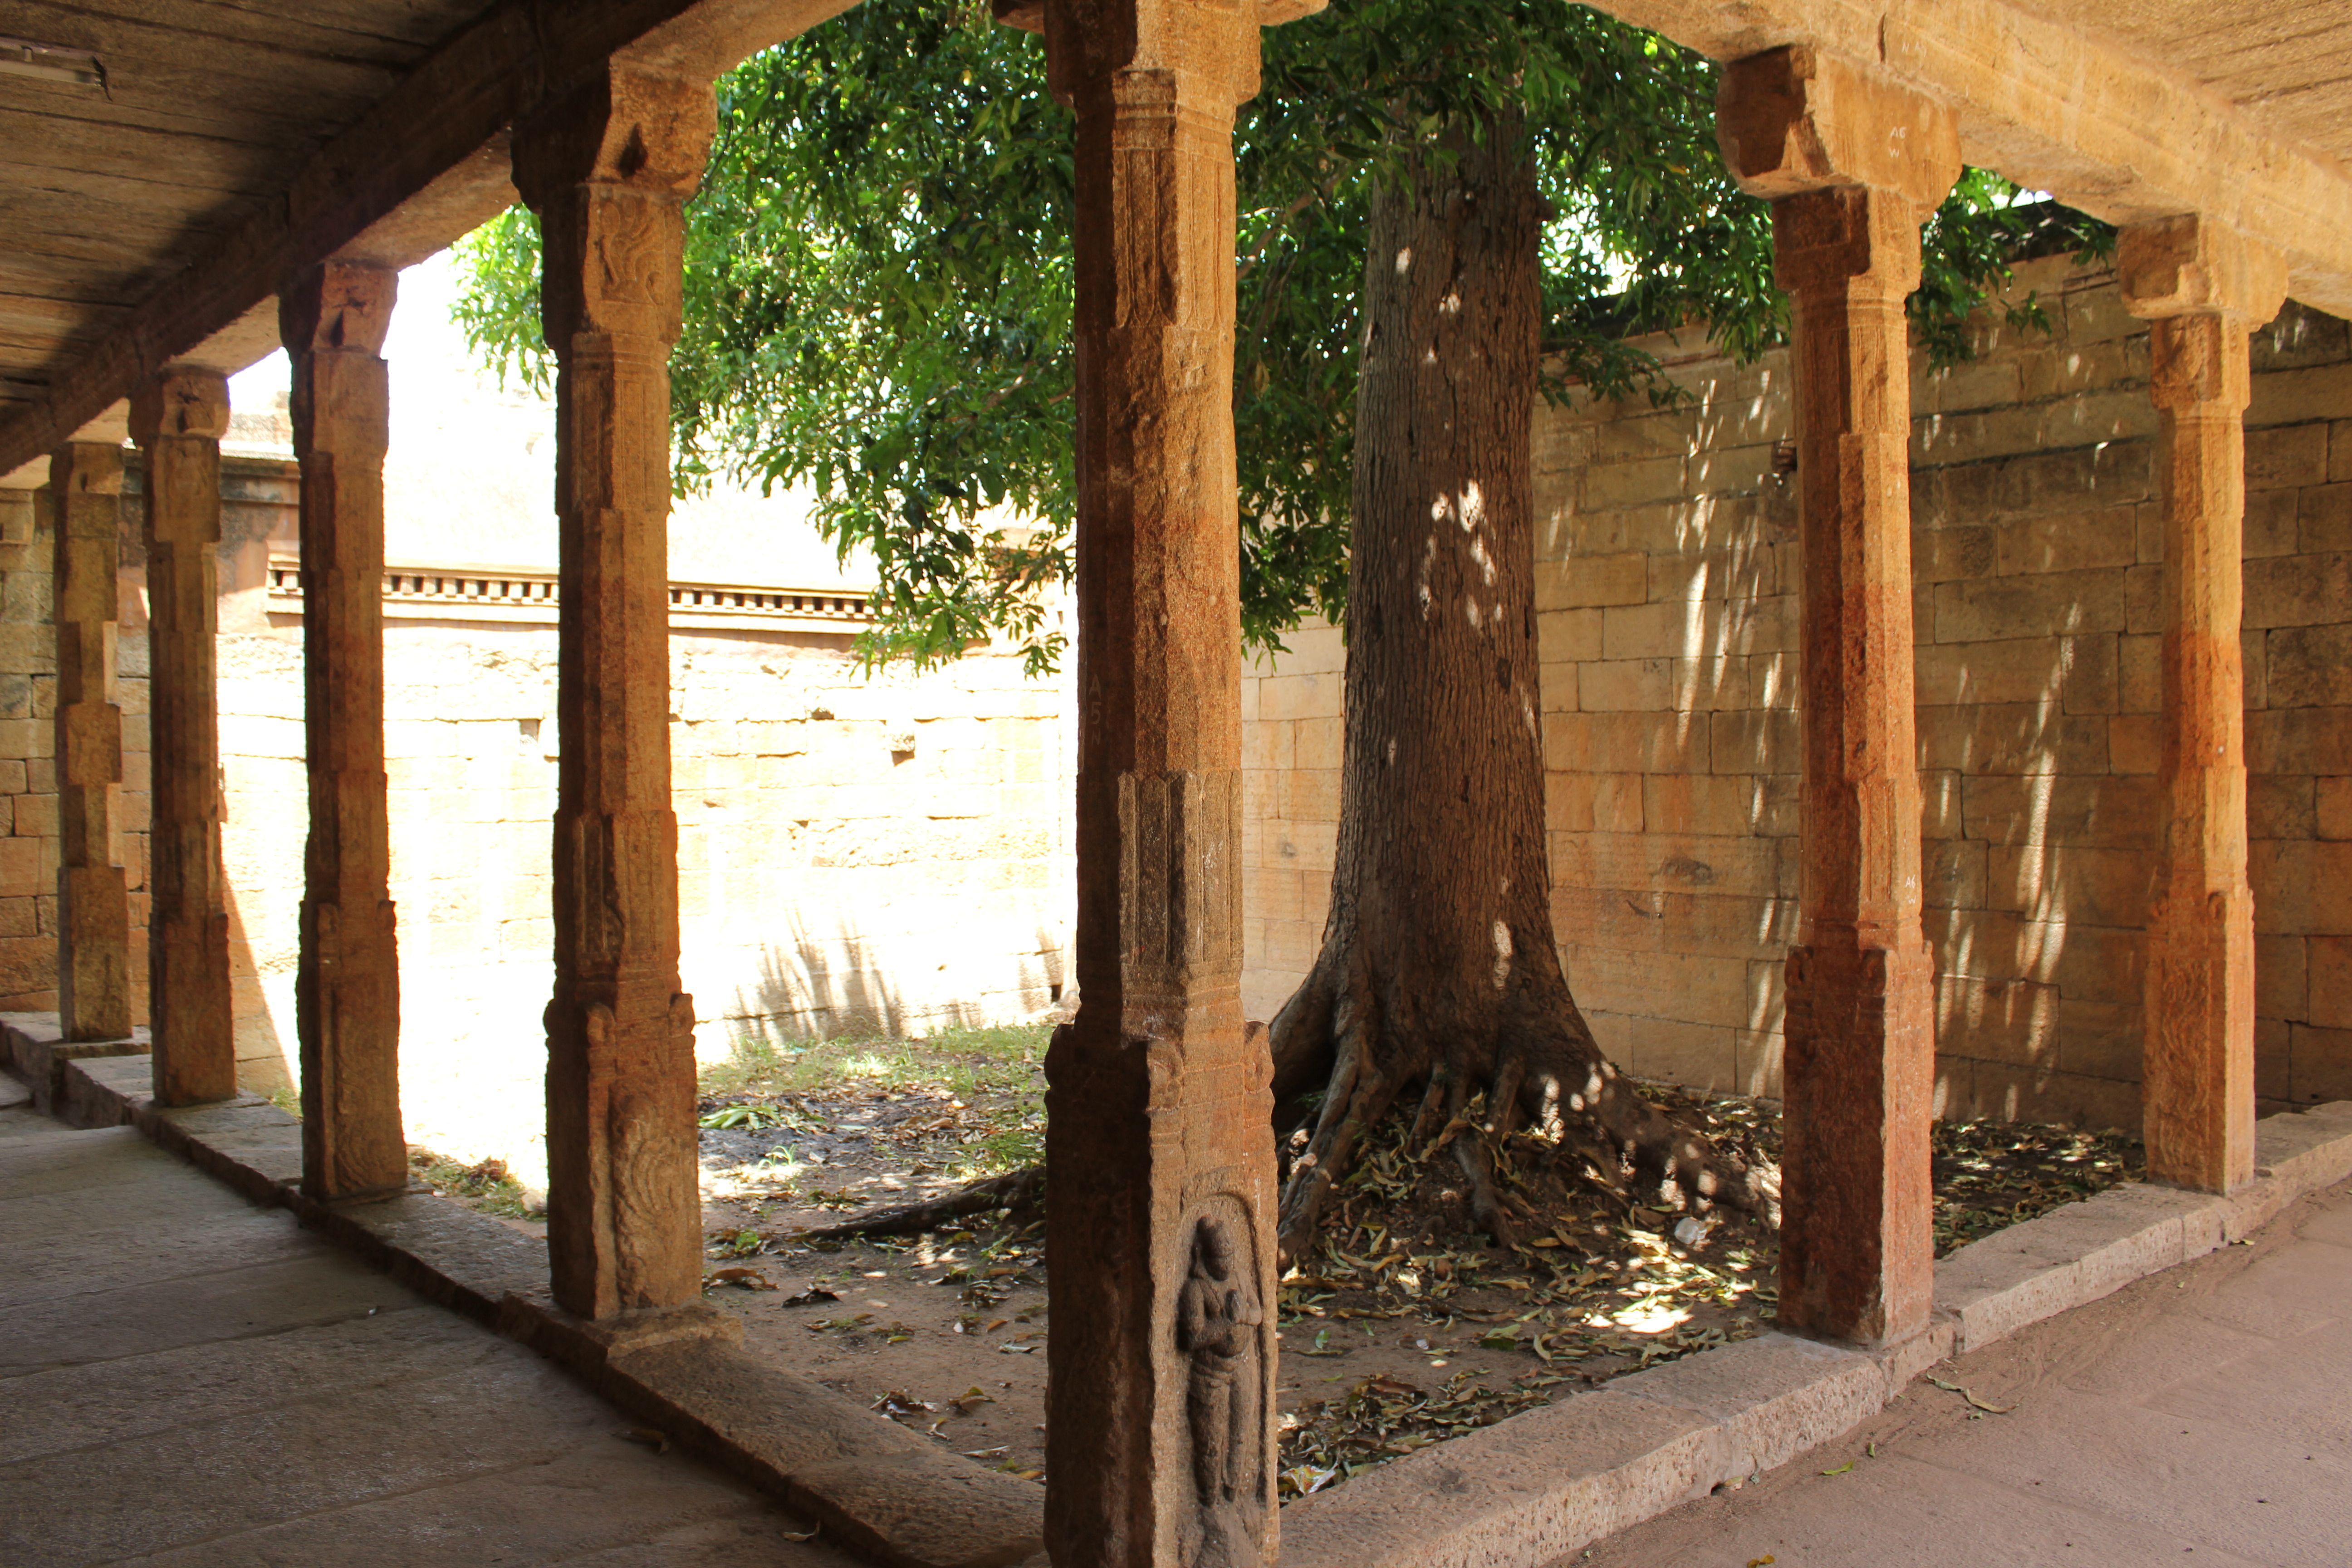 D'life home interiors kochi kerala pin by kamalan travels on deep into the southern lands  pinterest